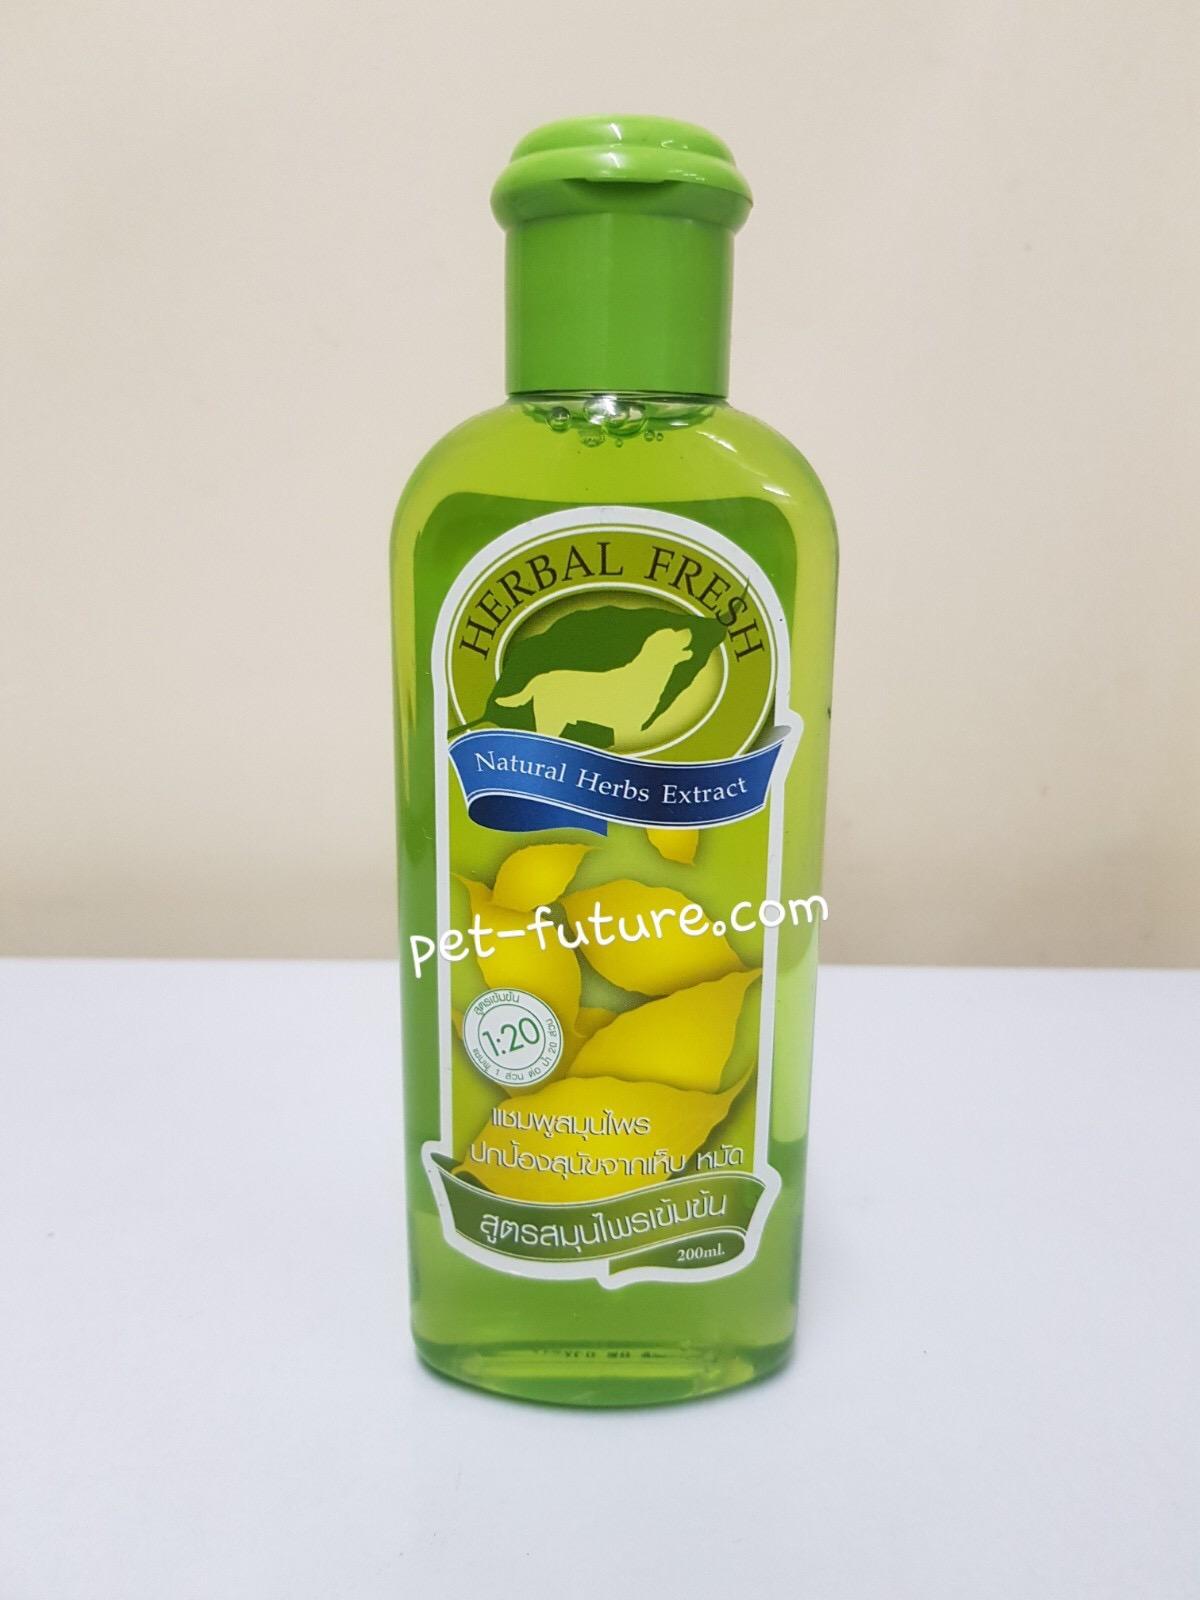 Herbal Fresh 200 ml. แชมพูสมุนไพรปกป้องสุนัขจากเห็บ หมัด